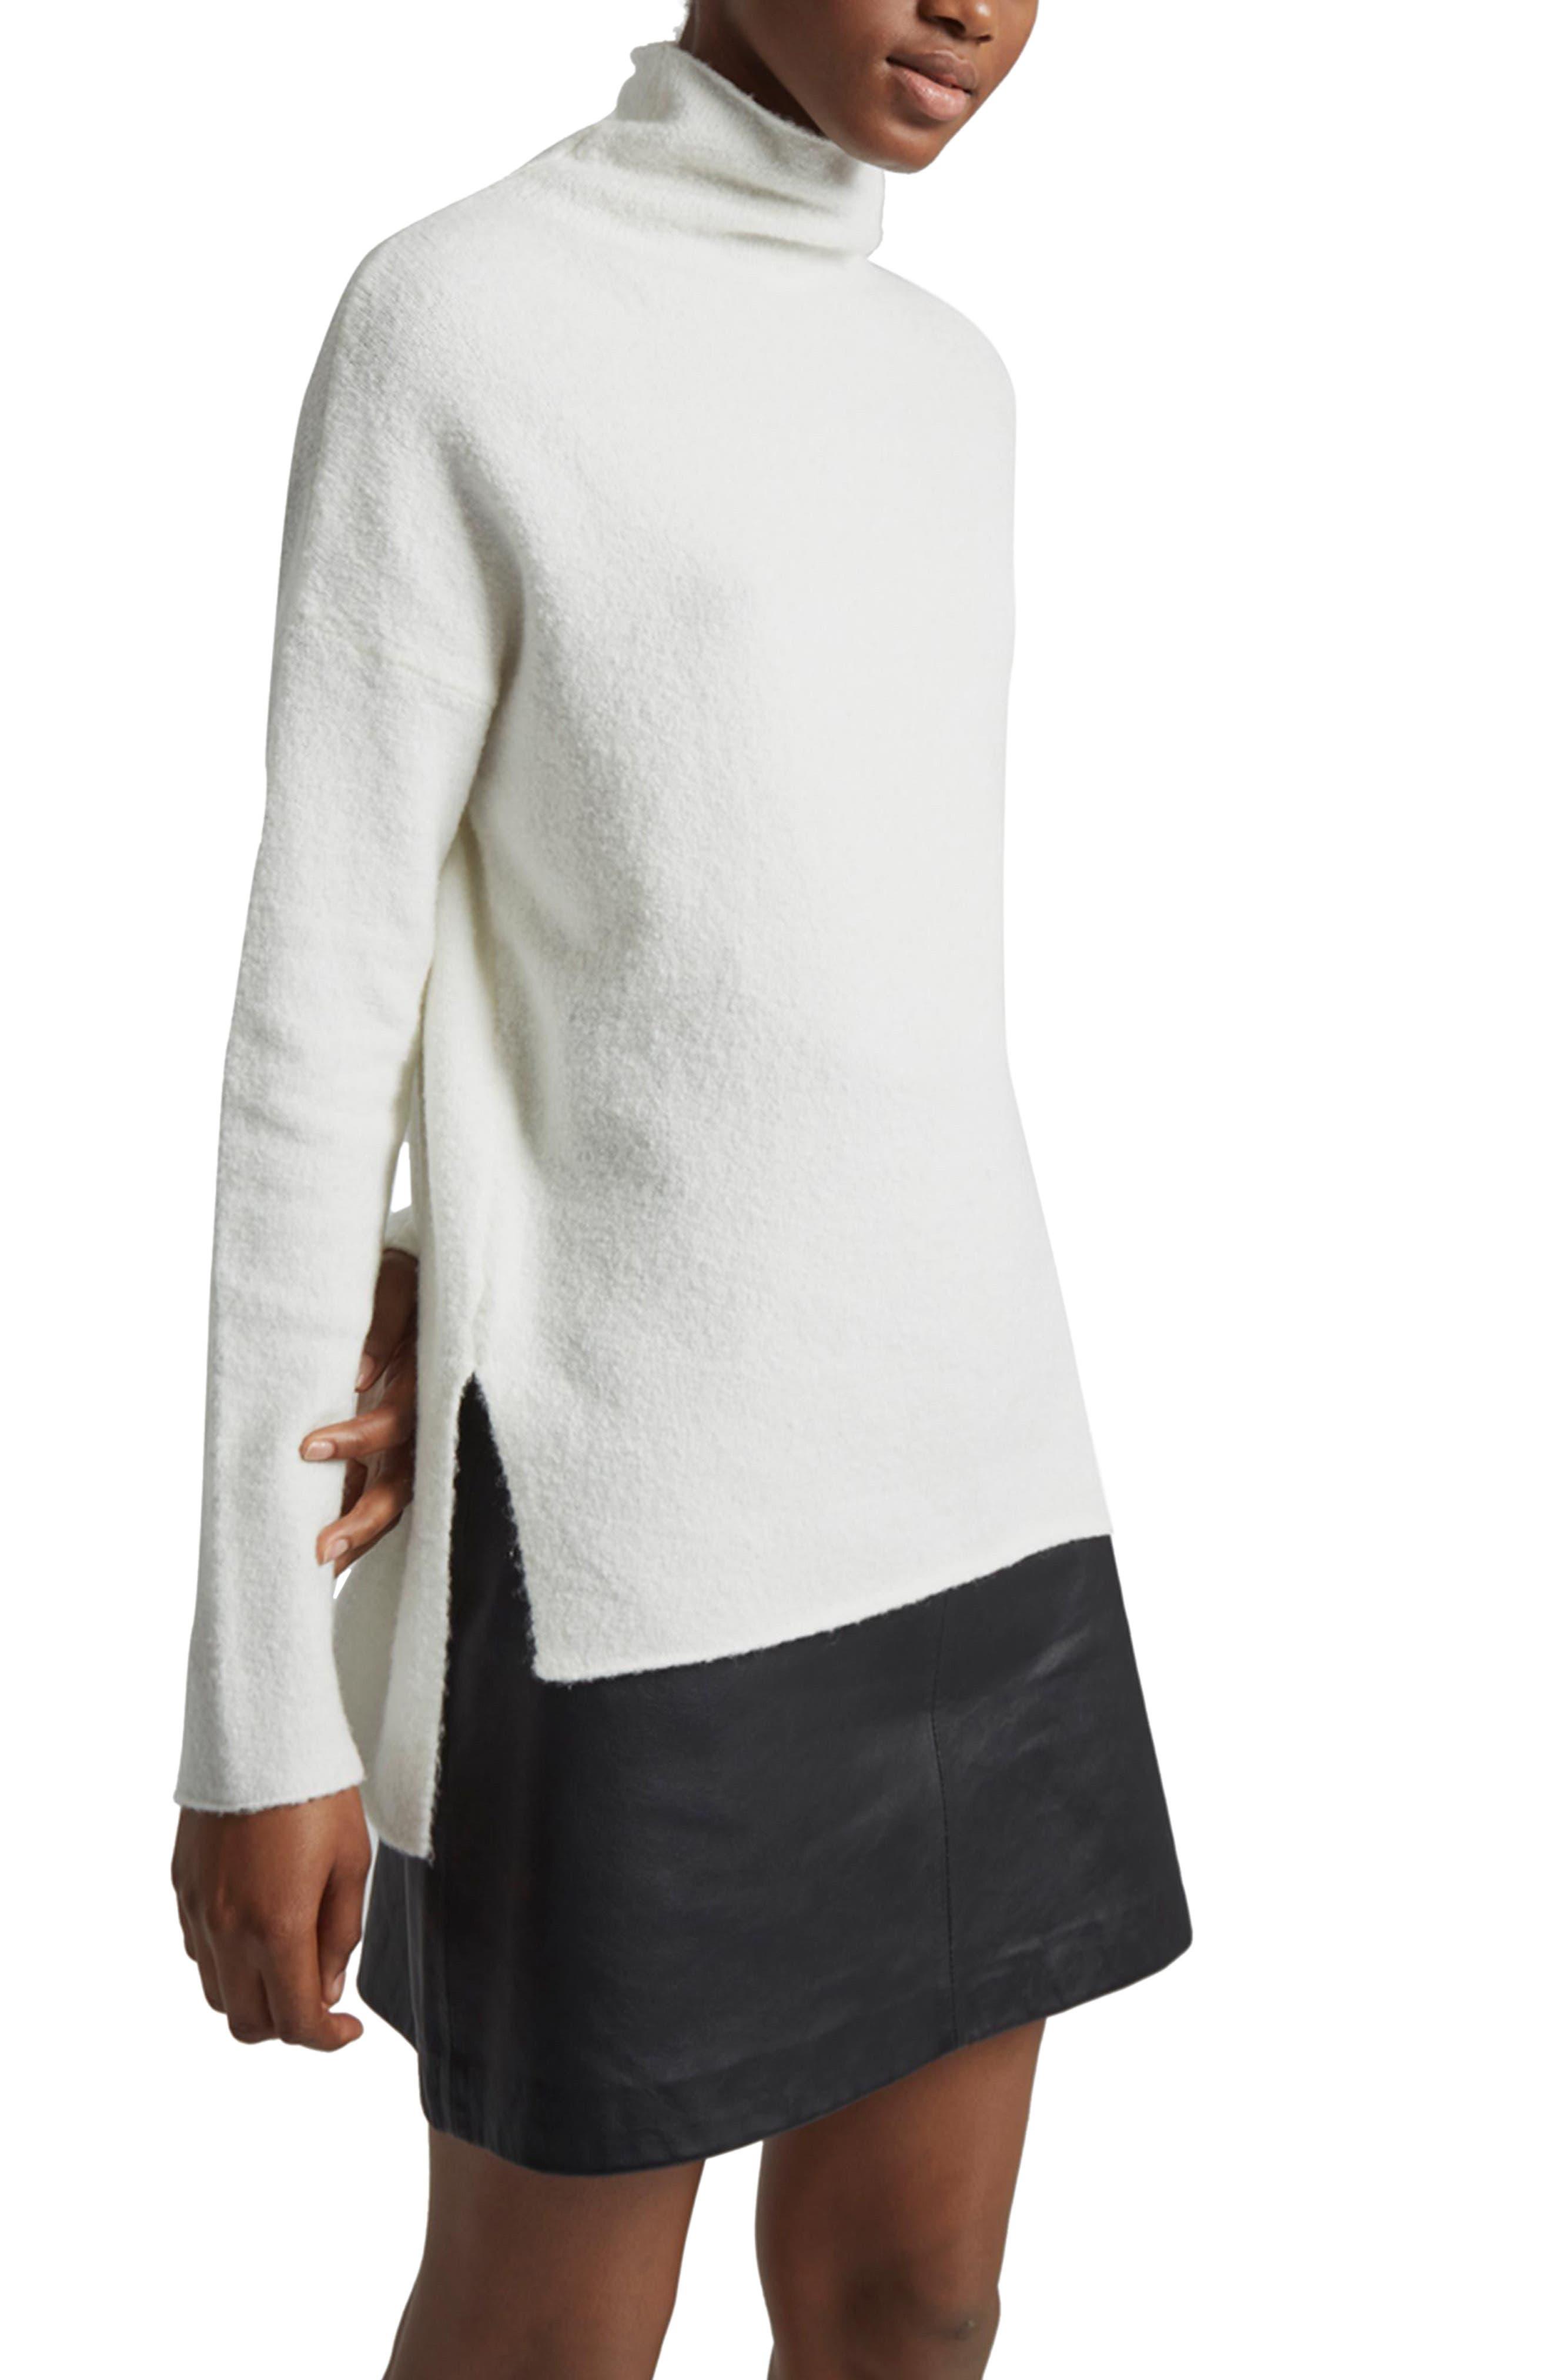 Aya Flossy Mock Neck Sweater,                             Main thumbnail 1, color,                             Winter White